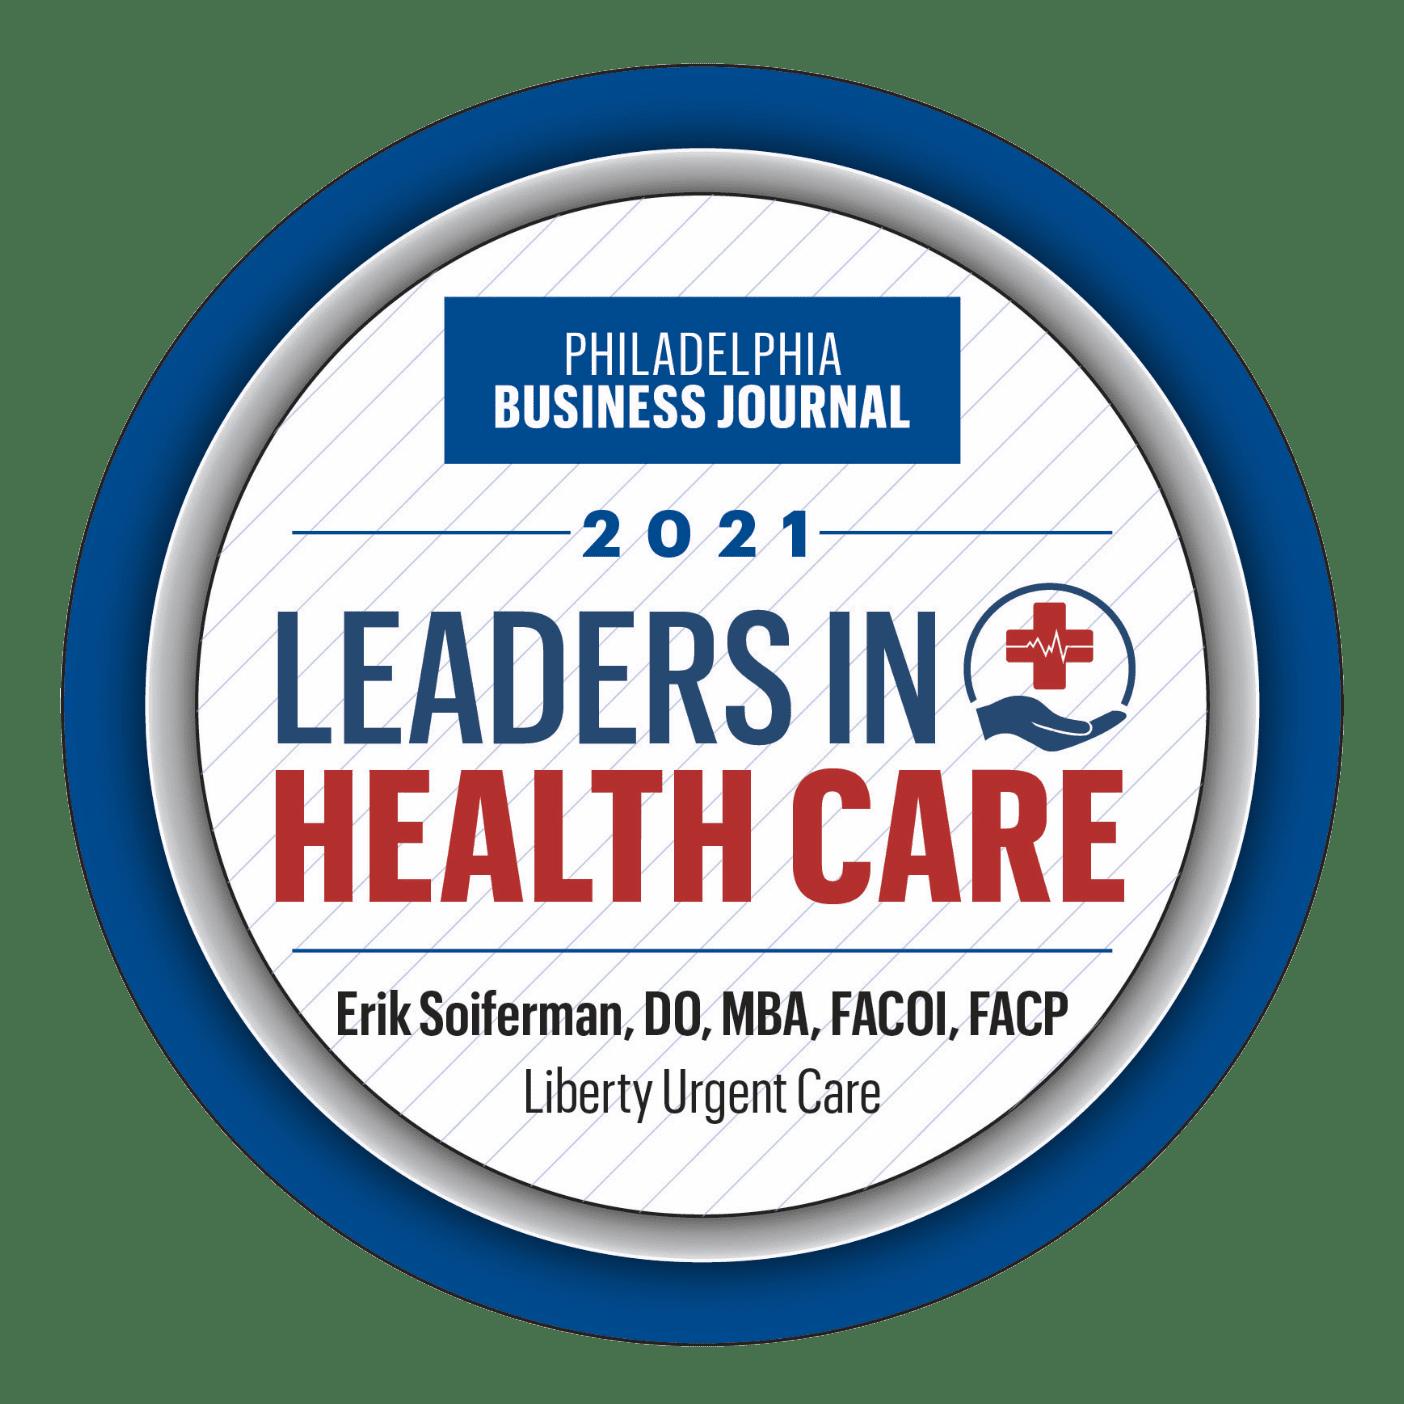 2021 Leaders in Healthcare award